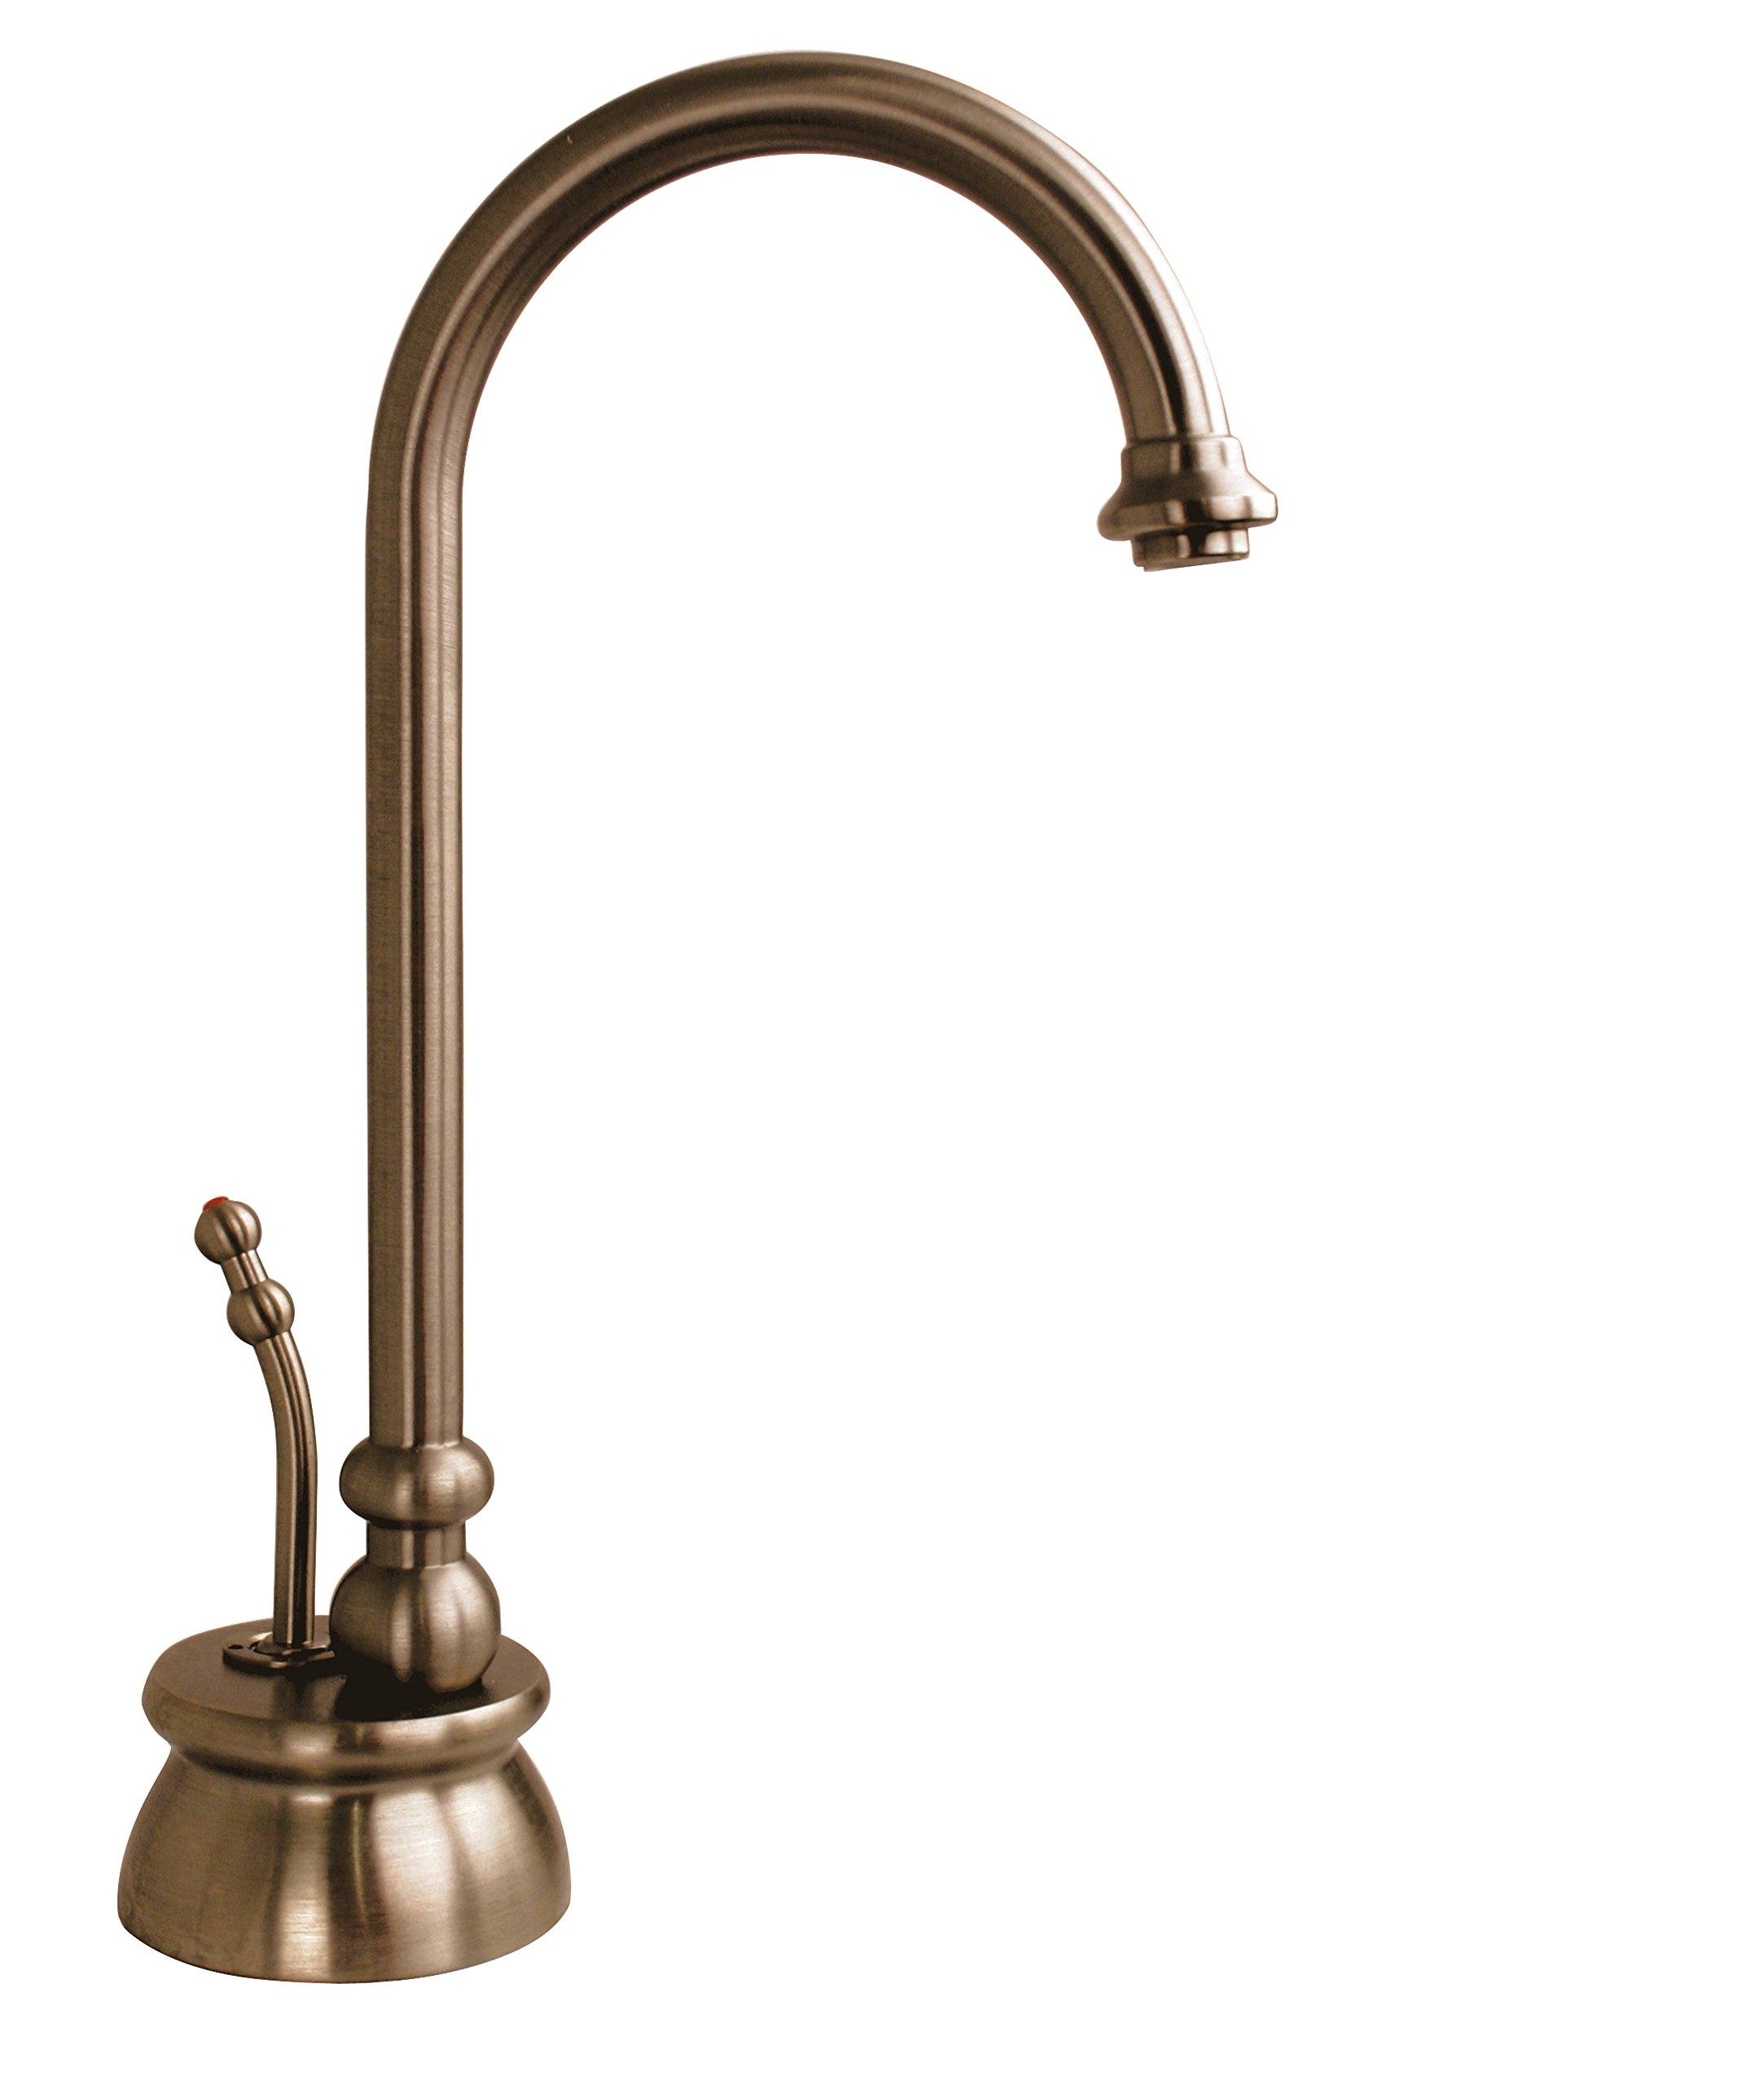 Westbrass D261-11 Single Handle Instant Hot Water Dispenser Faucet Only, Antique Copper